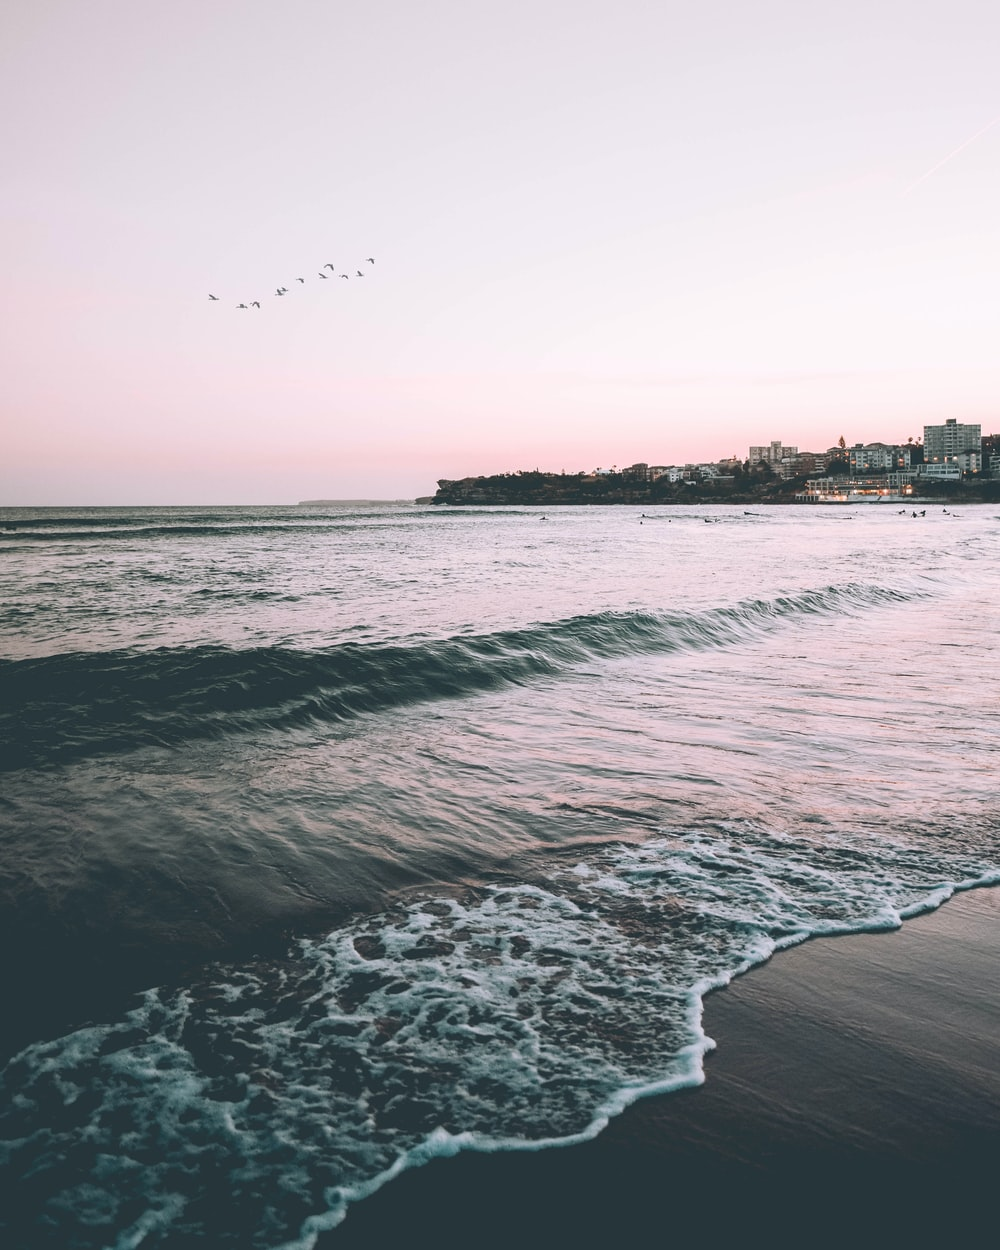 birds flying over seashore